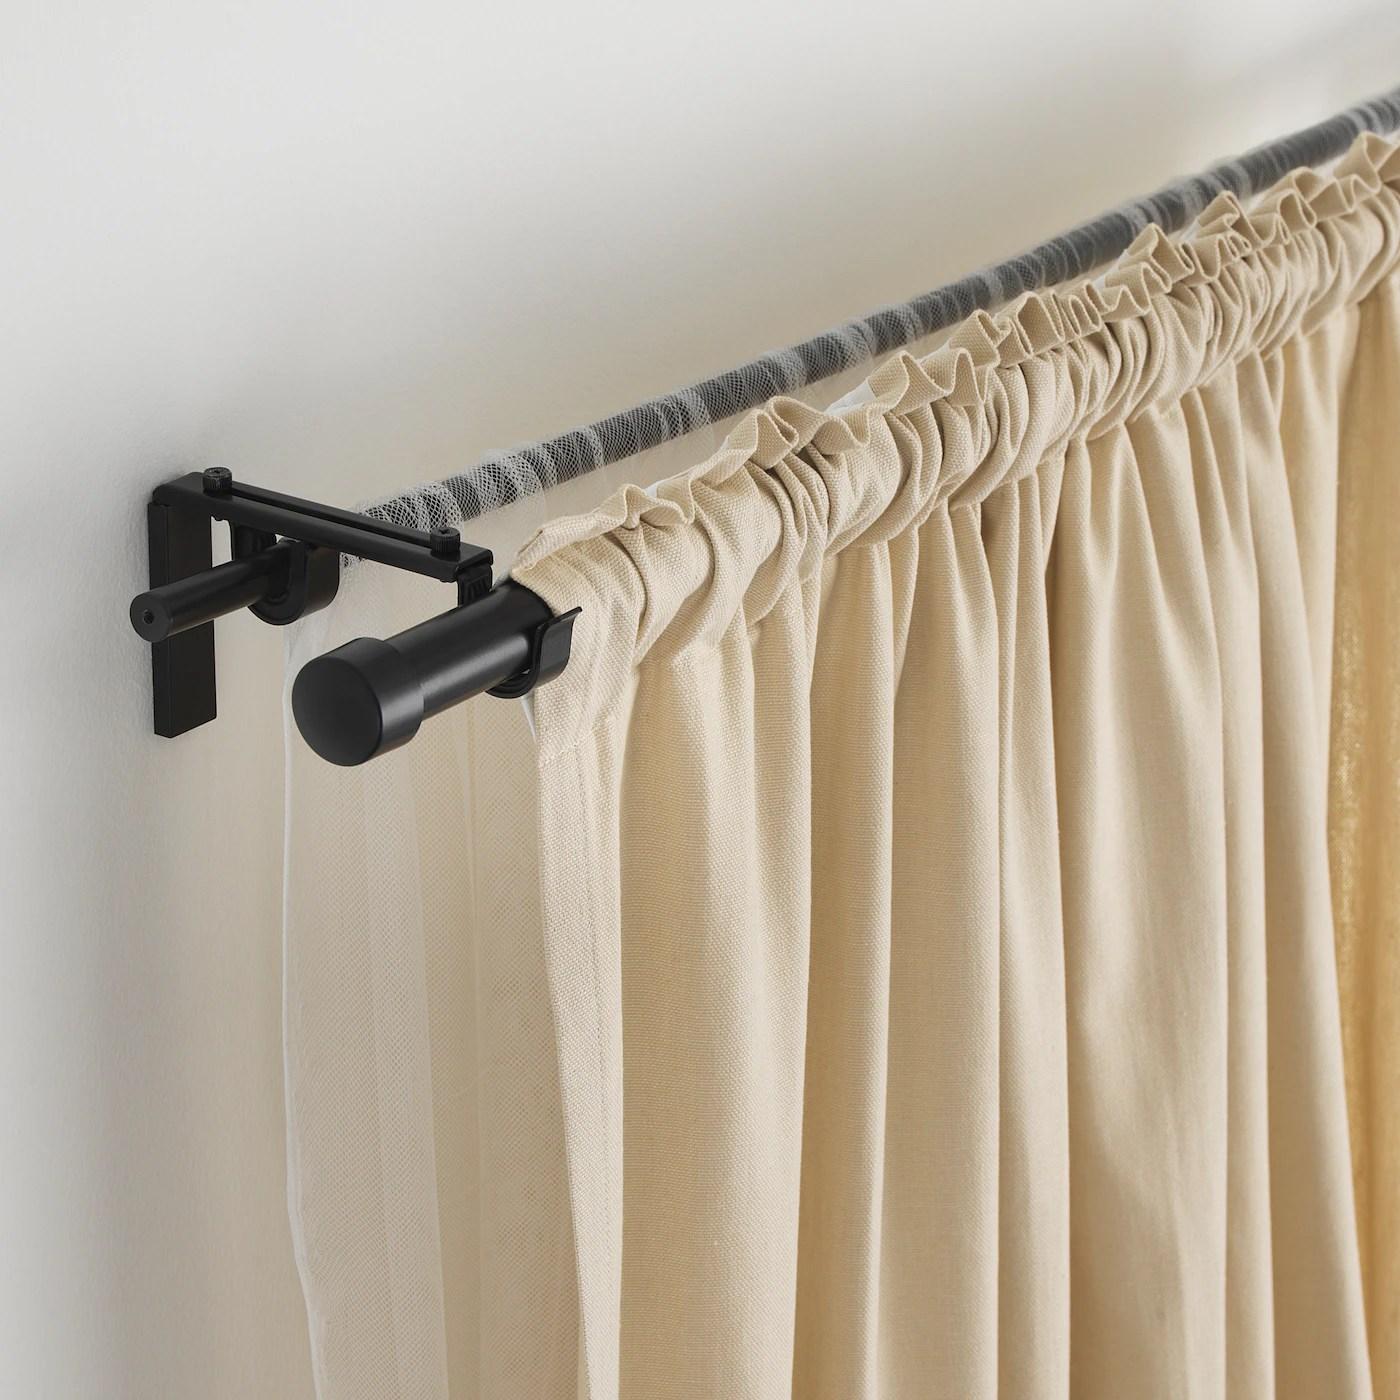 racka hugad double curtain rod combination black 210 385 cm